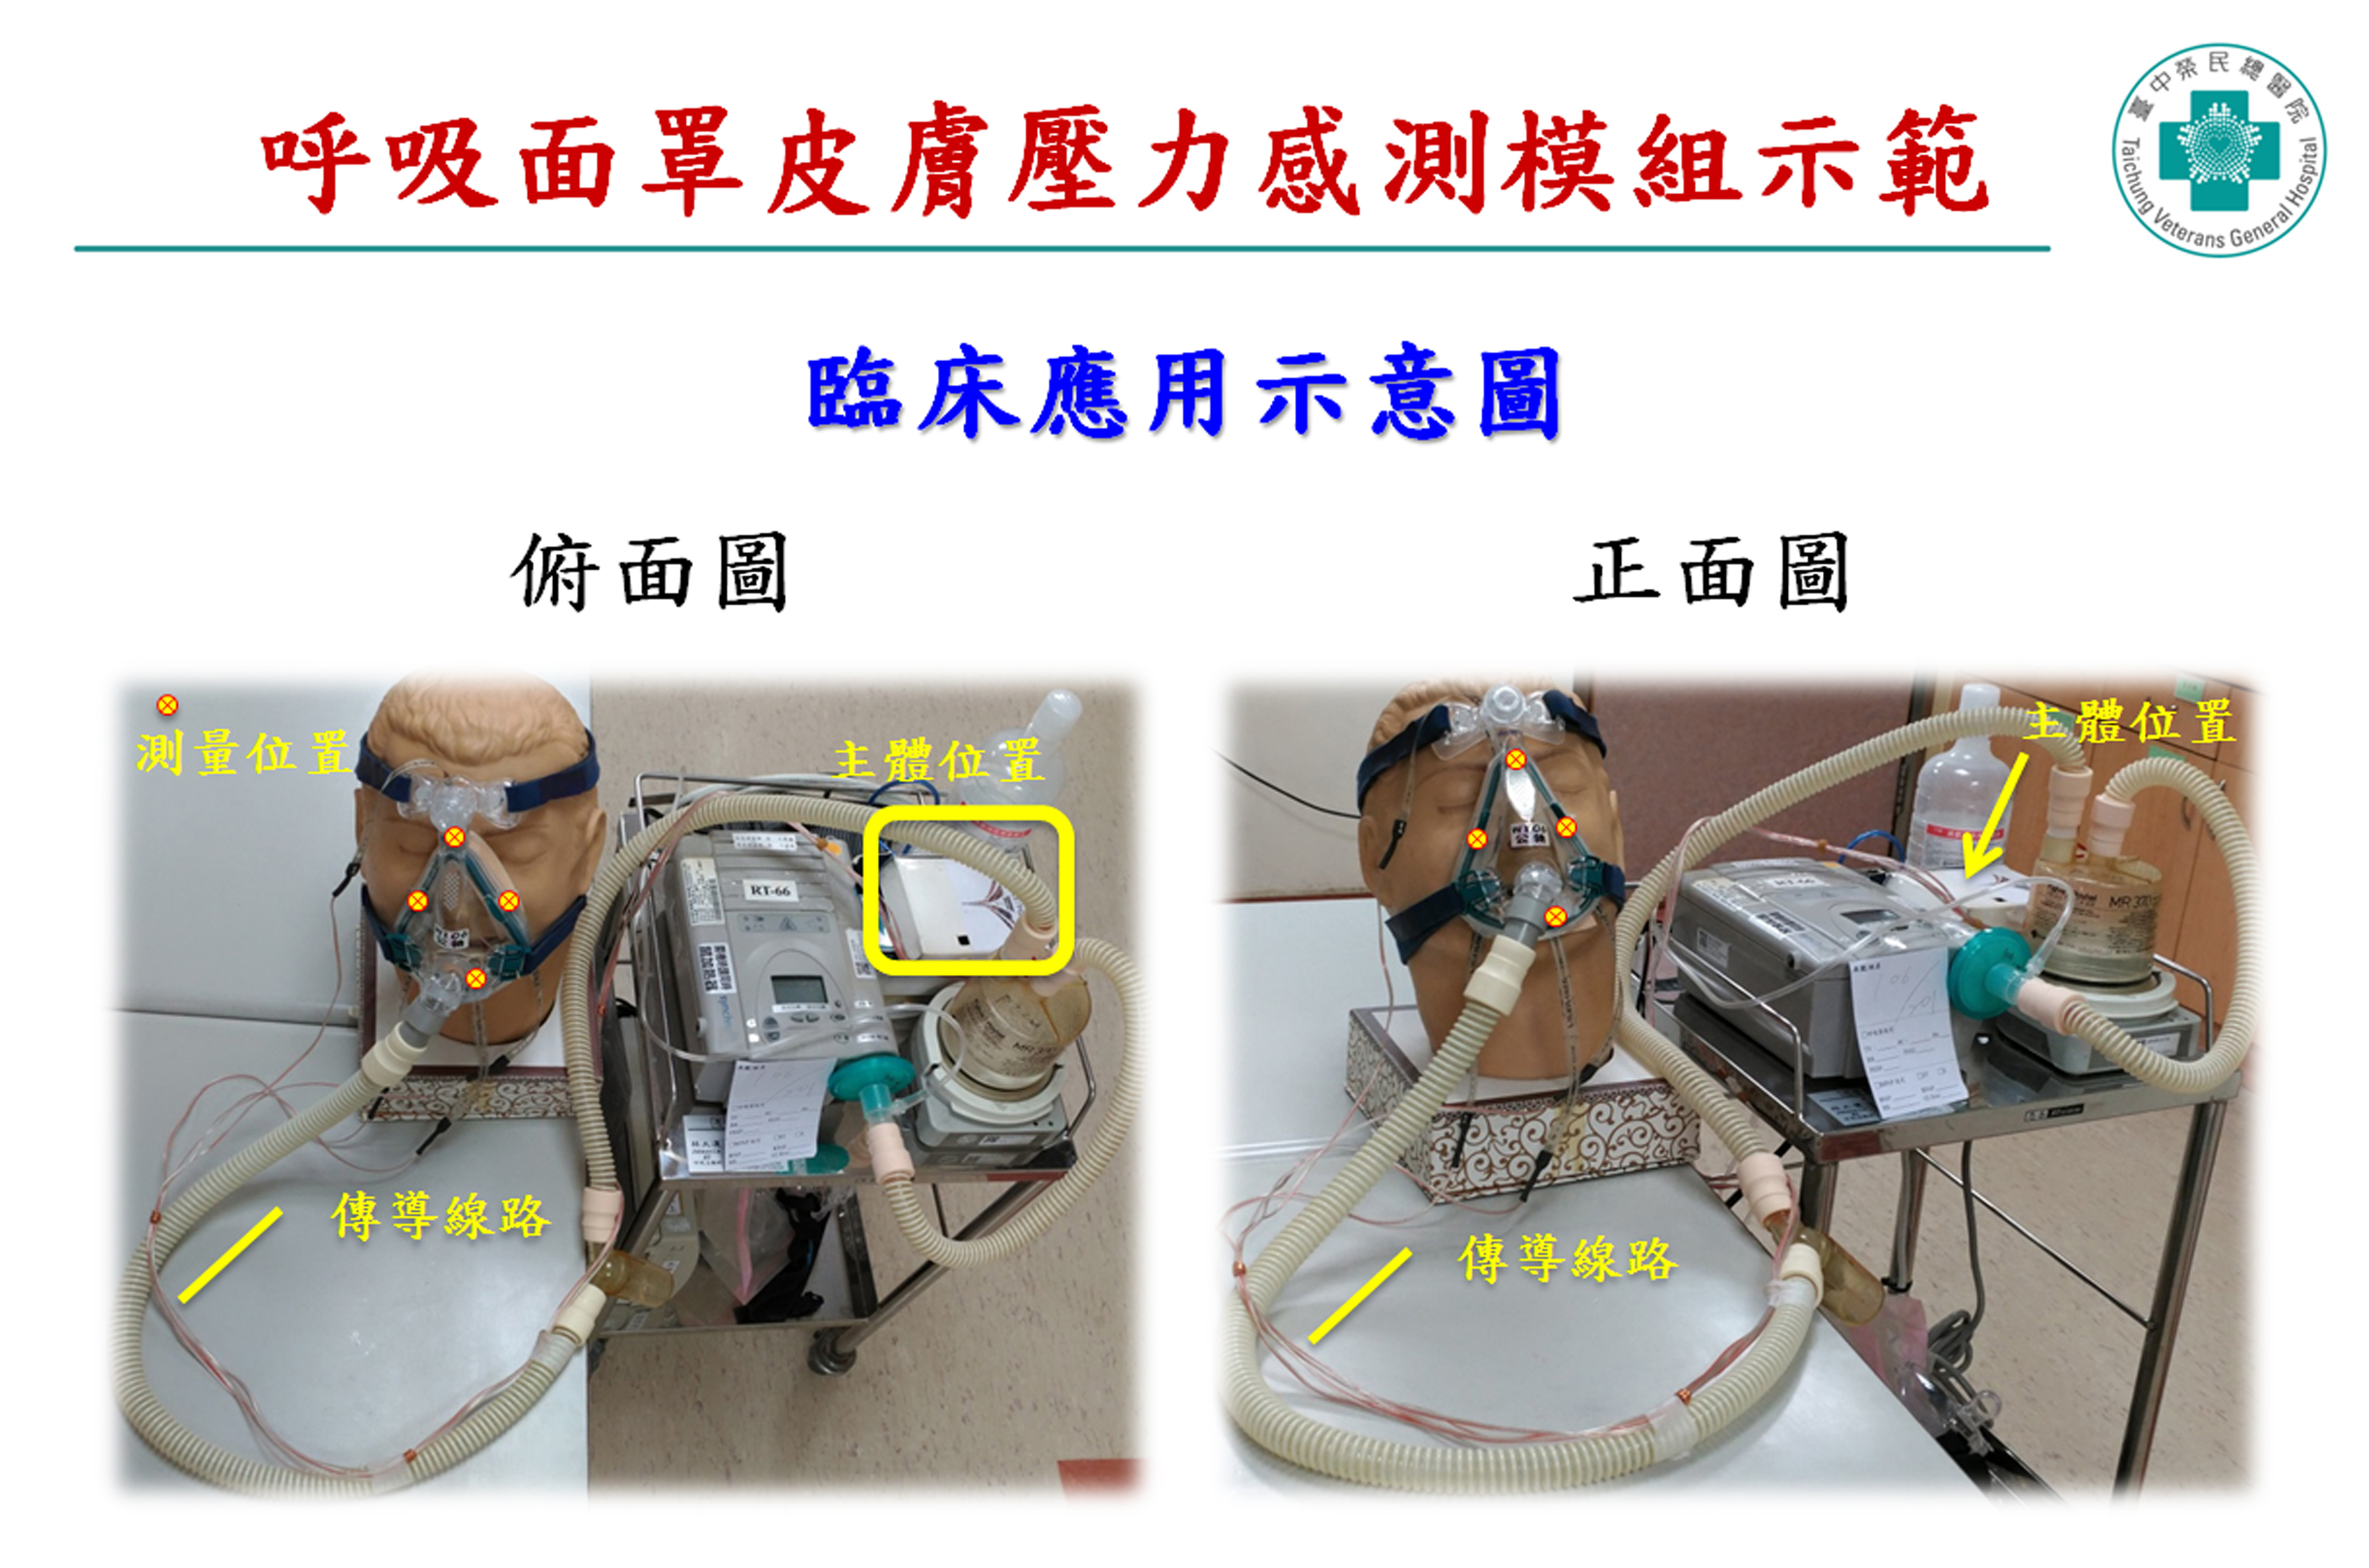 14D12-5-呼吸面罩皮膚壓力感測模組臨床應用示意圖.jpg